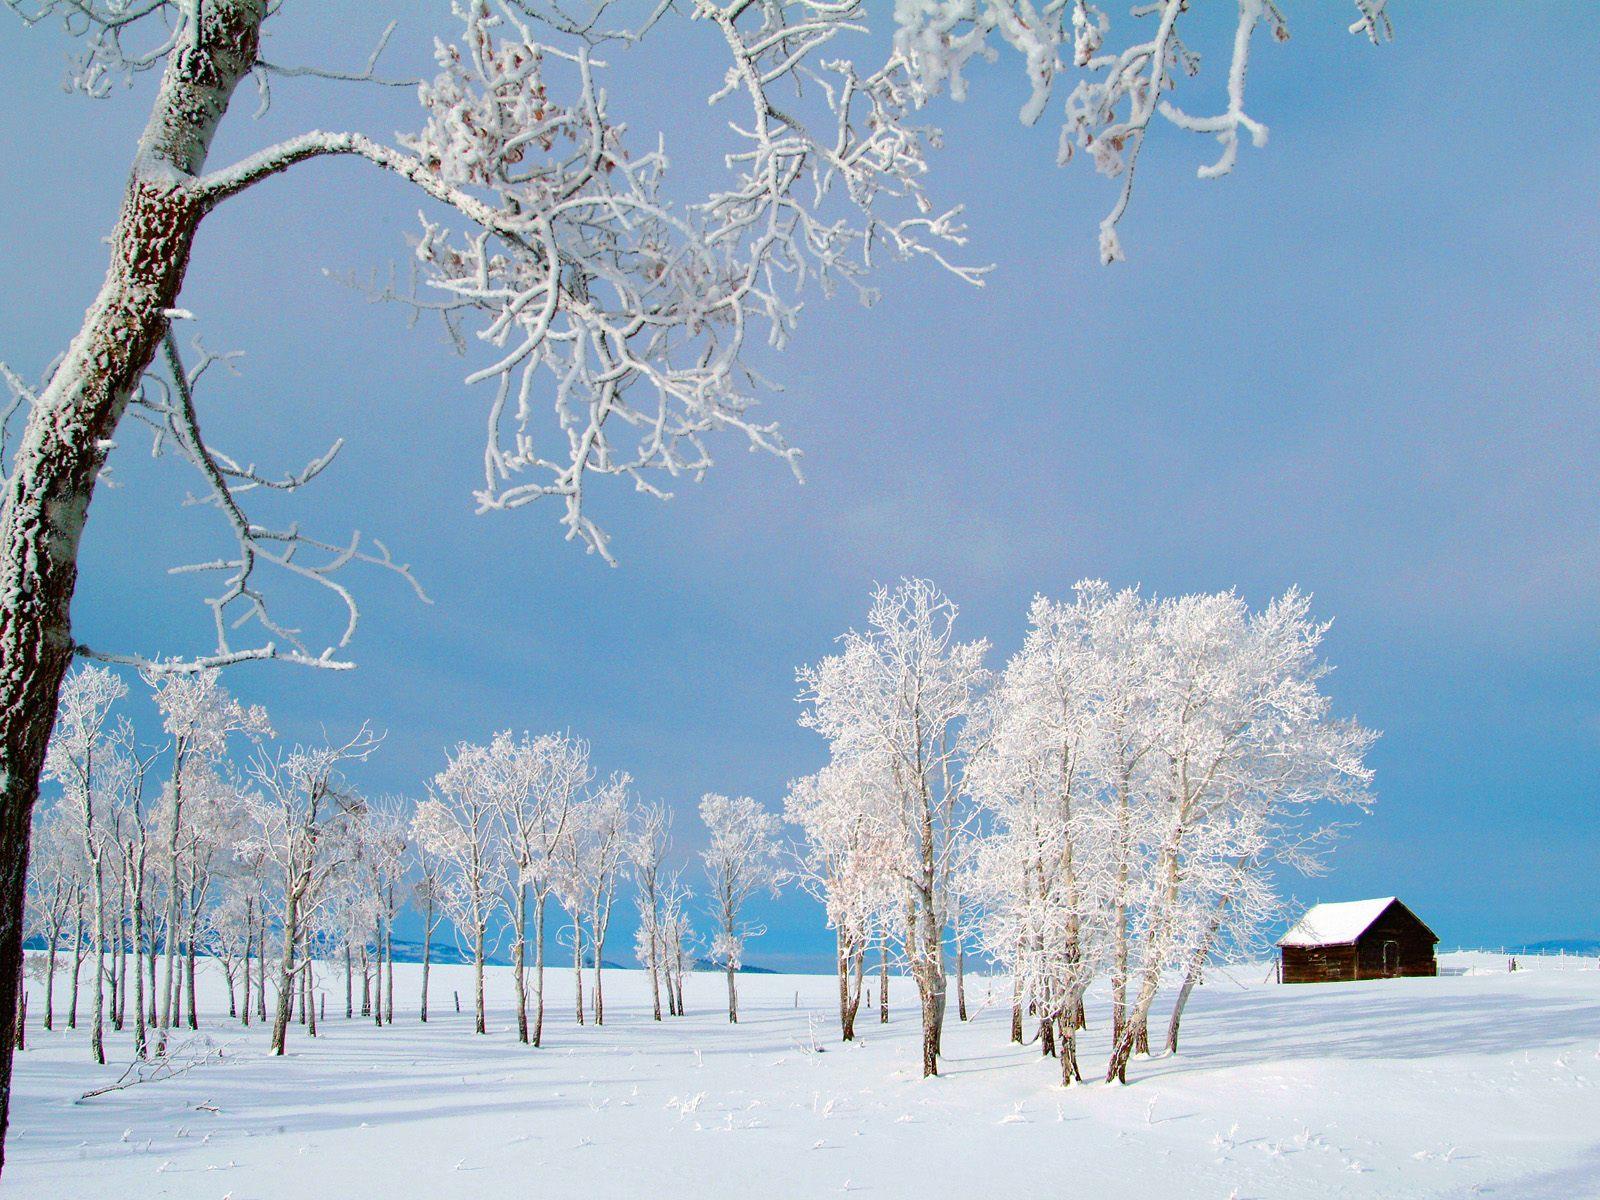 http://1.bp.blogspot.com/-9TUcB13Z8zY/TtUpA7KzeGI/AAAAAAAAKbI/JorE08frcao/s1600/winter-wallpaper-024.jpg